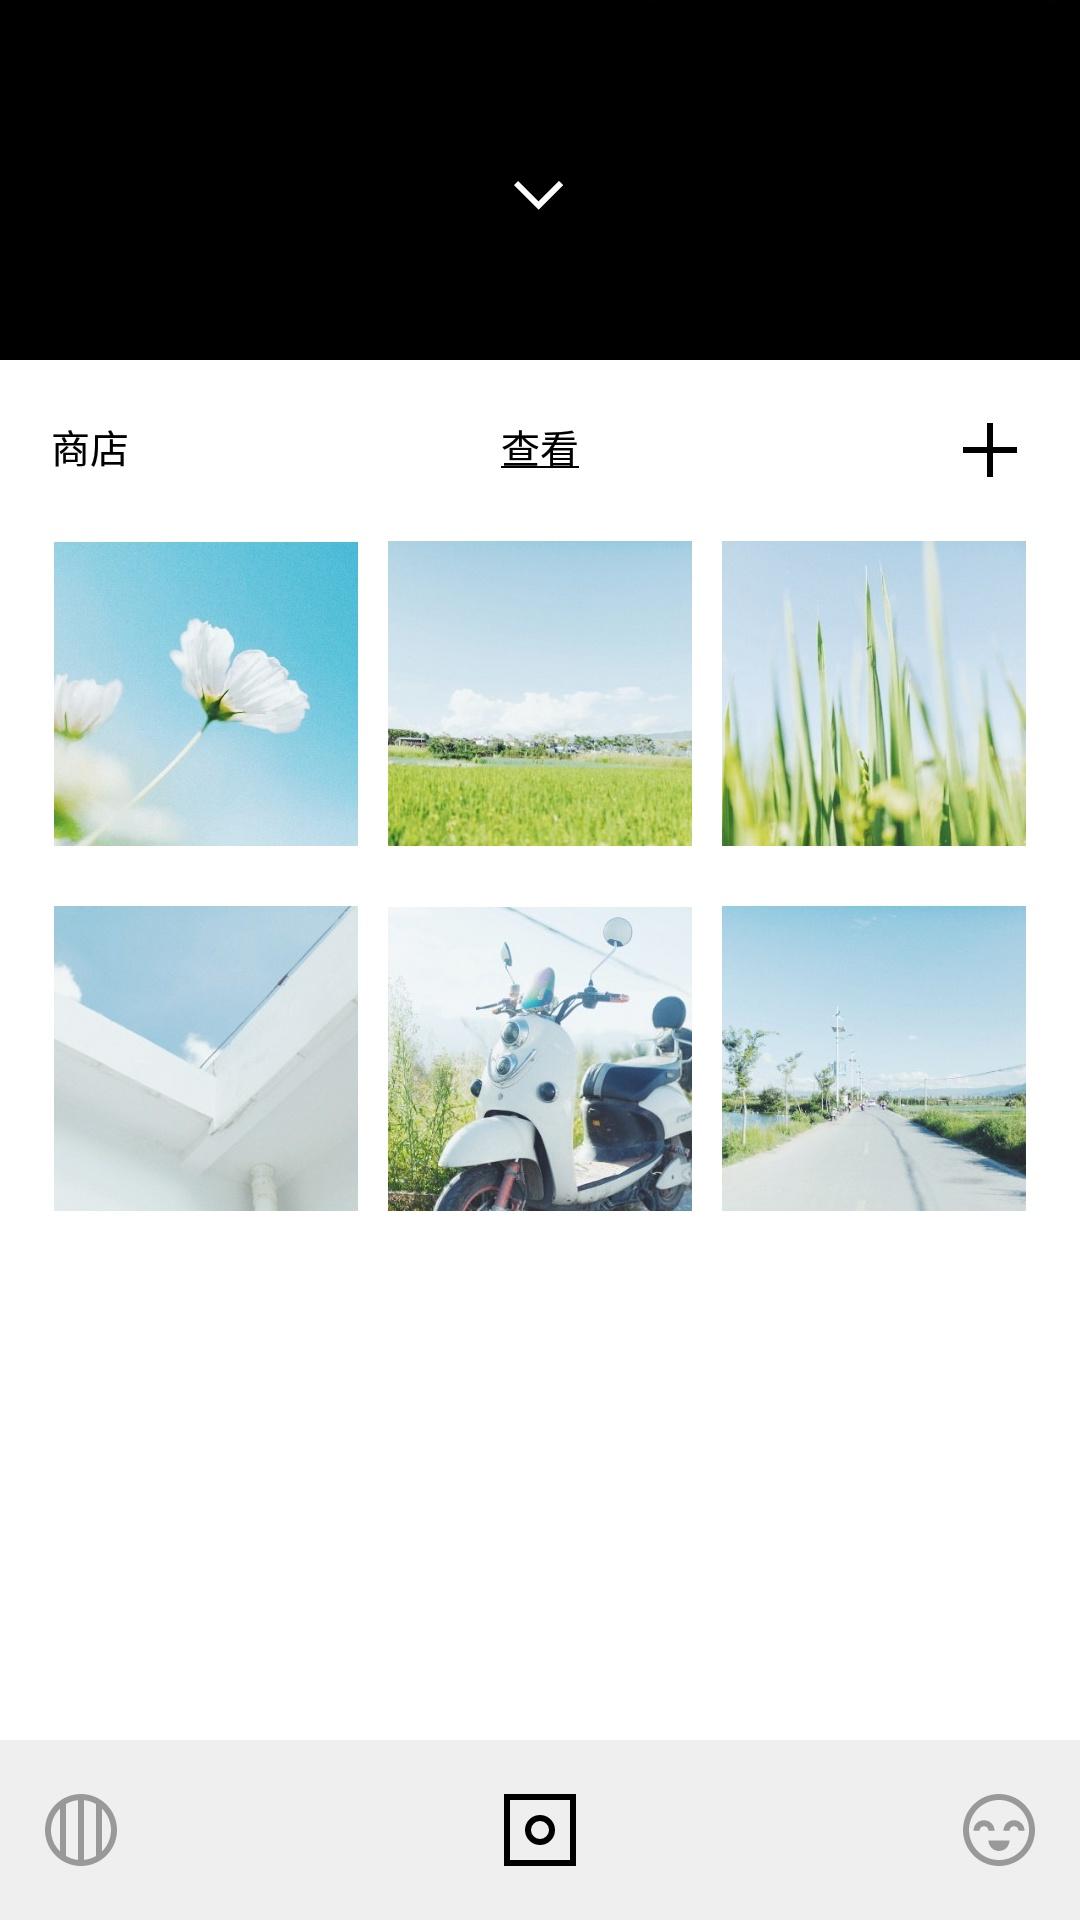 S70909-163730.jpg